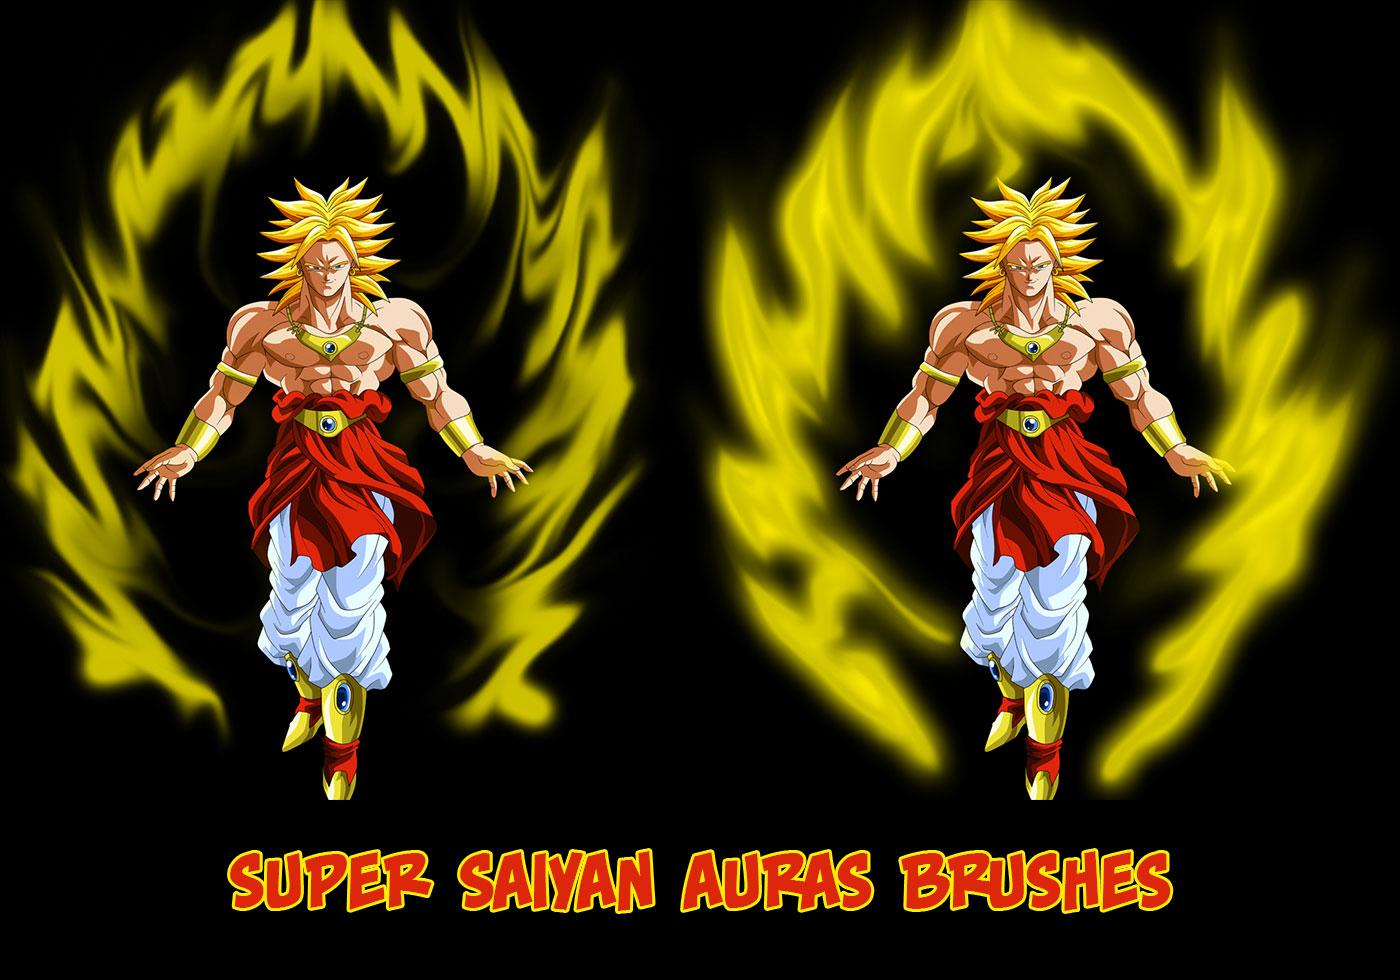 Super saiyan auras brushes for cs5 free photoshop brushes at brusheezy - Super sayenne ...